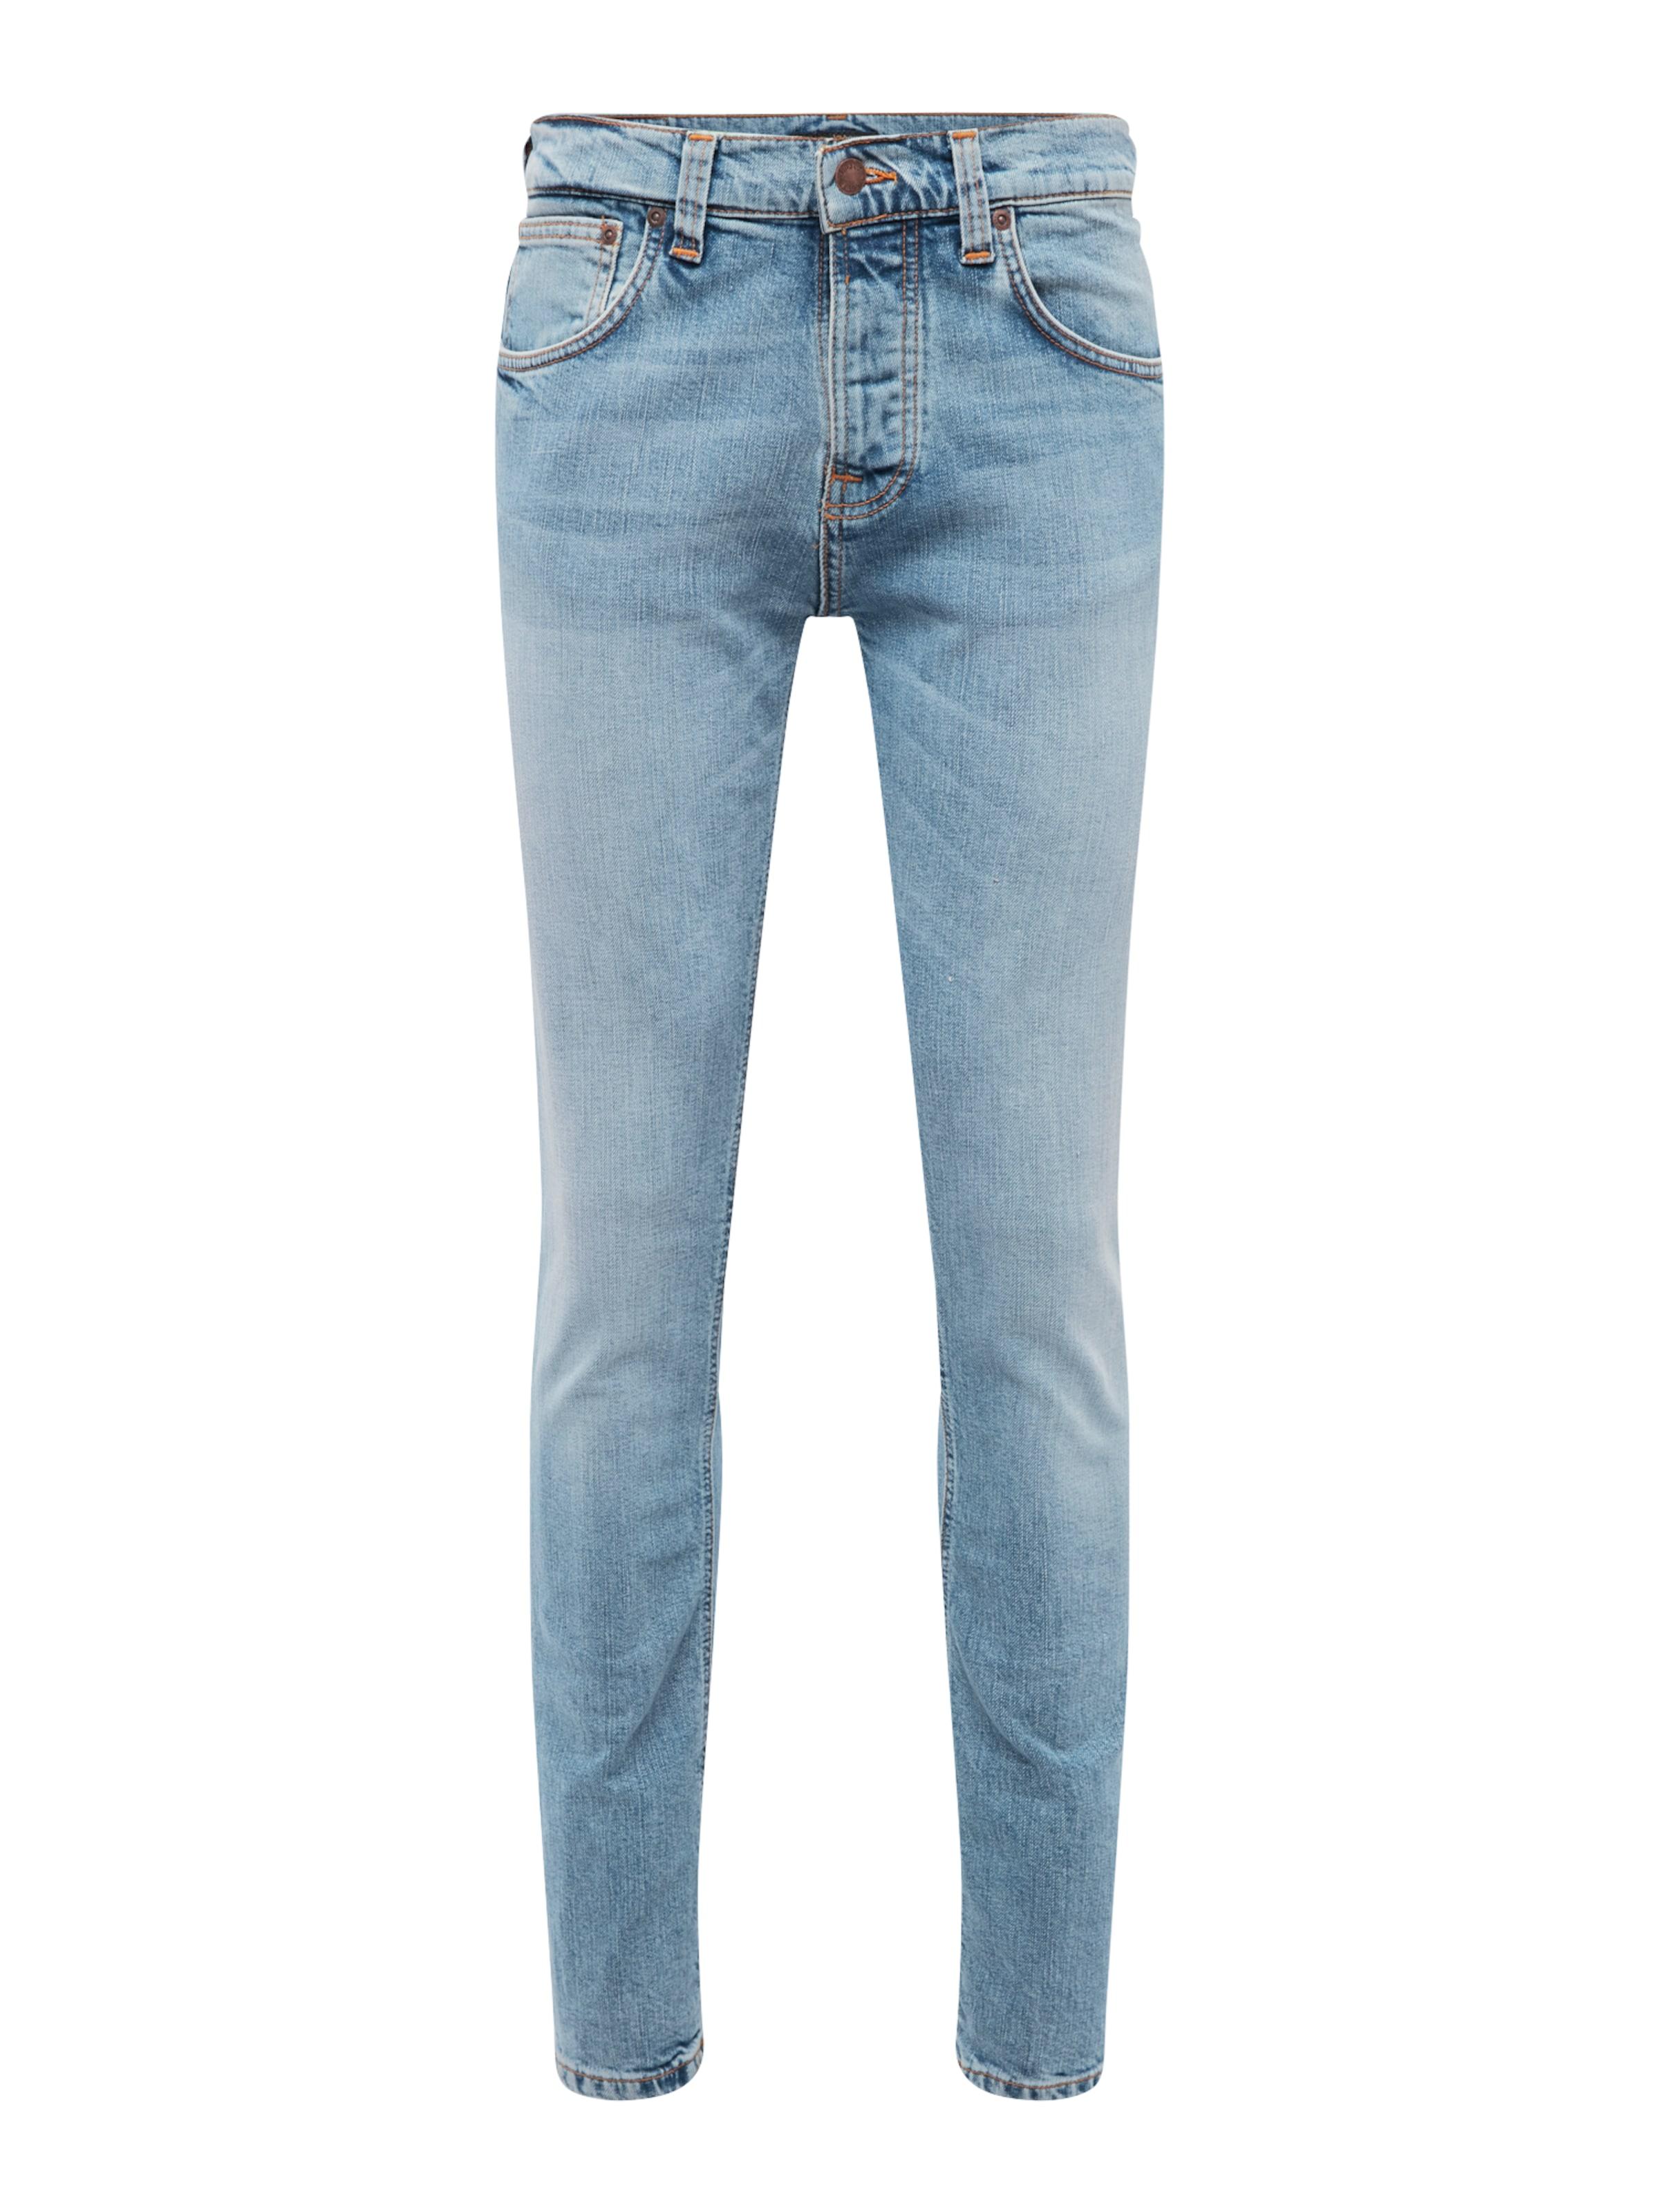 'grim Jeans Nudie Bleu Denim Tim' En Jean Co EQWBdCxero